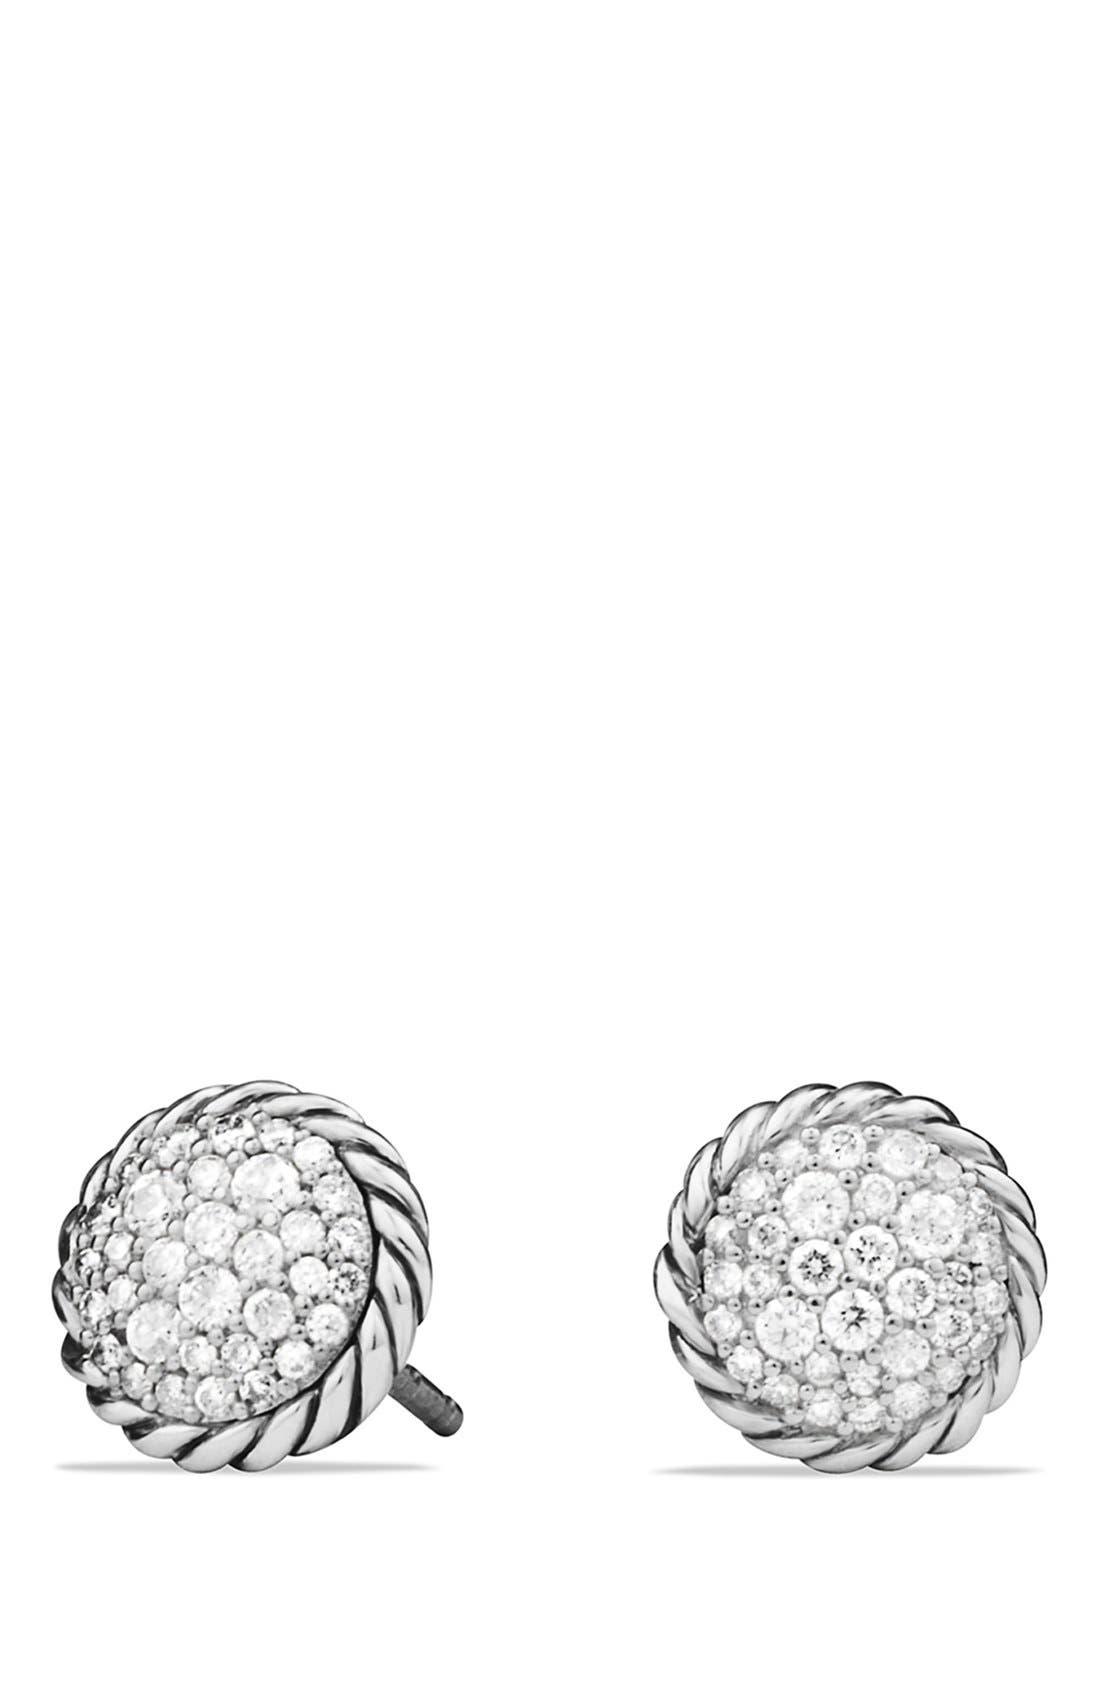 David Yurman 'Châtelaine' Pavé Earring with Diamonds